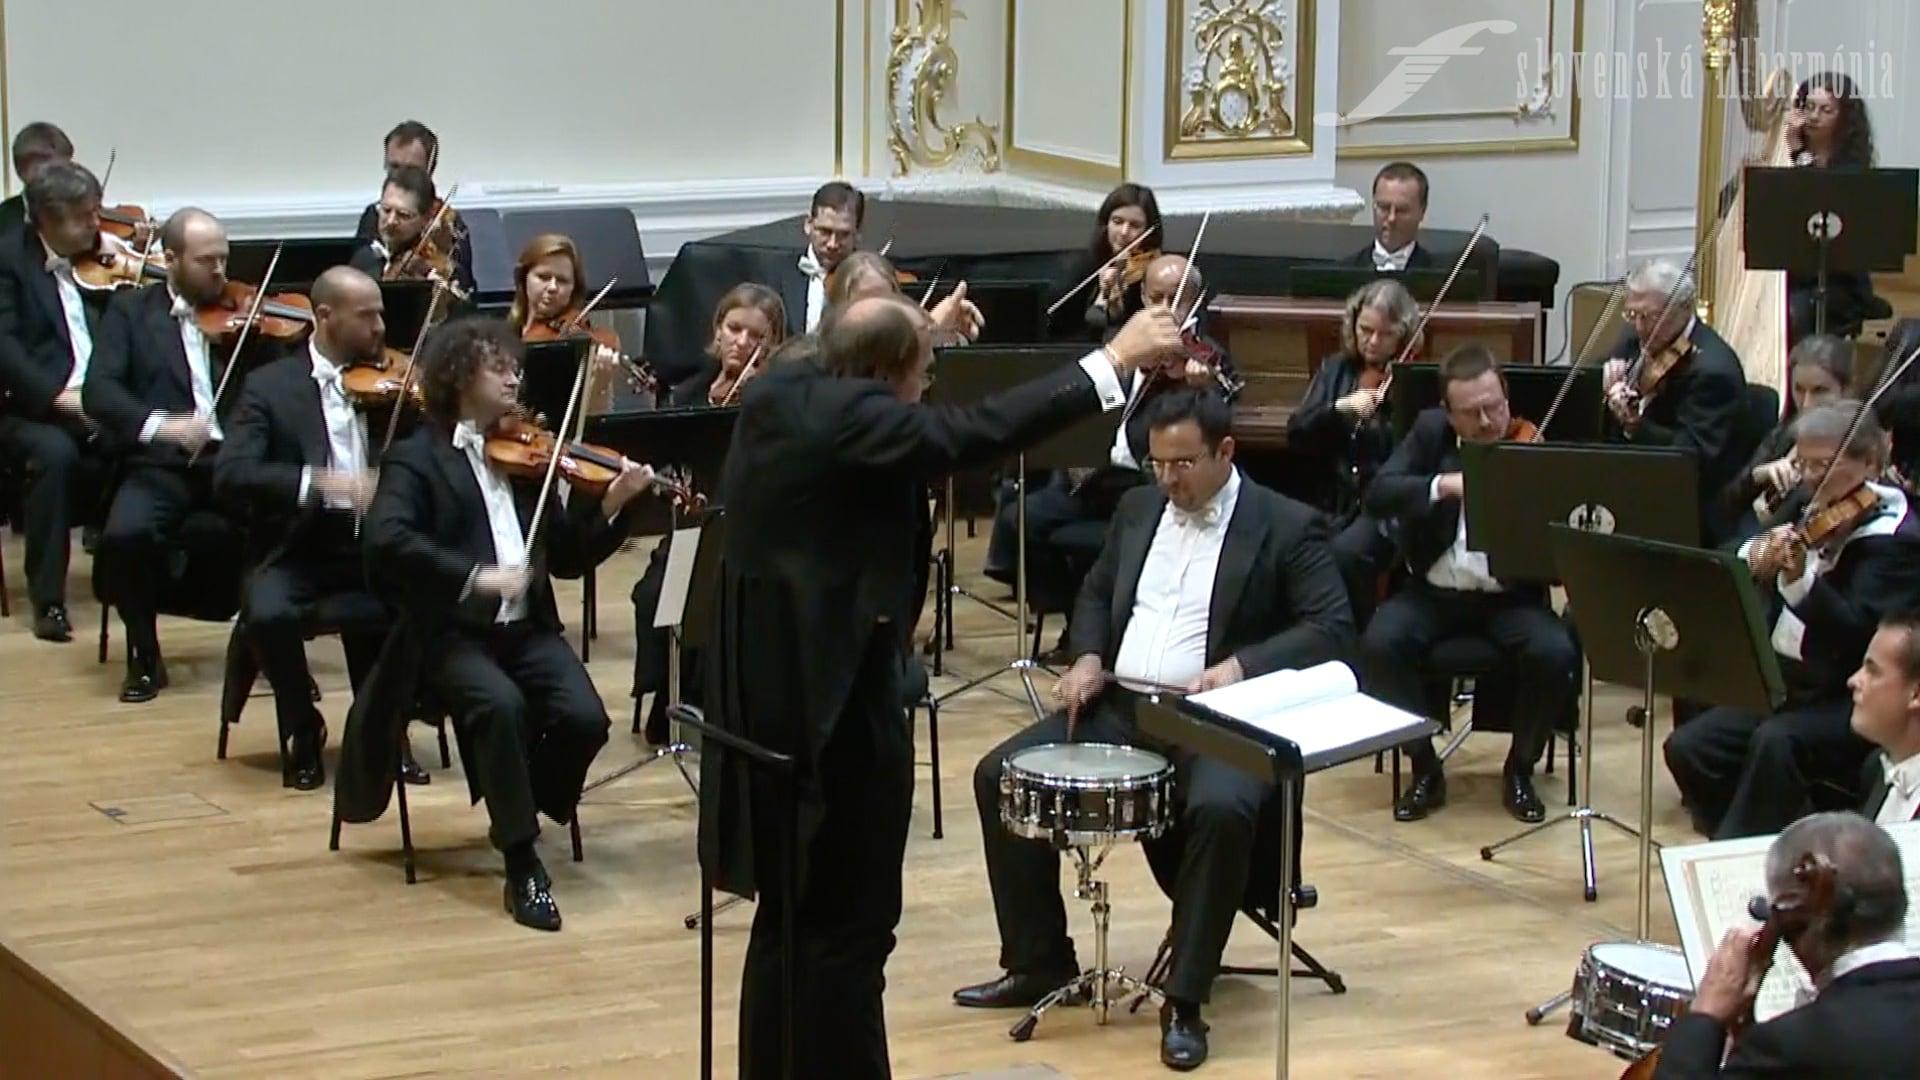 Mimoriadny koncert v spolupráci s Panasonic Concerts